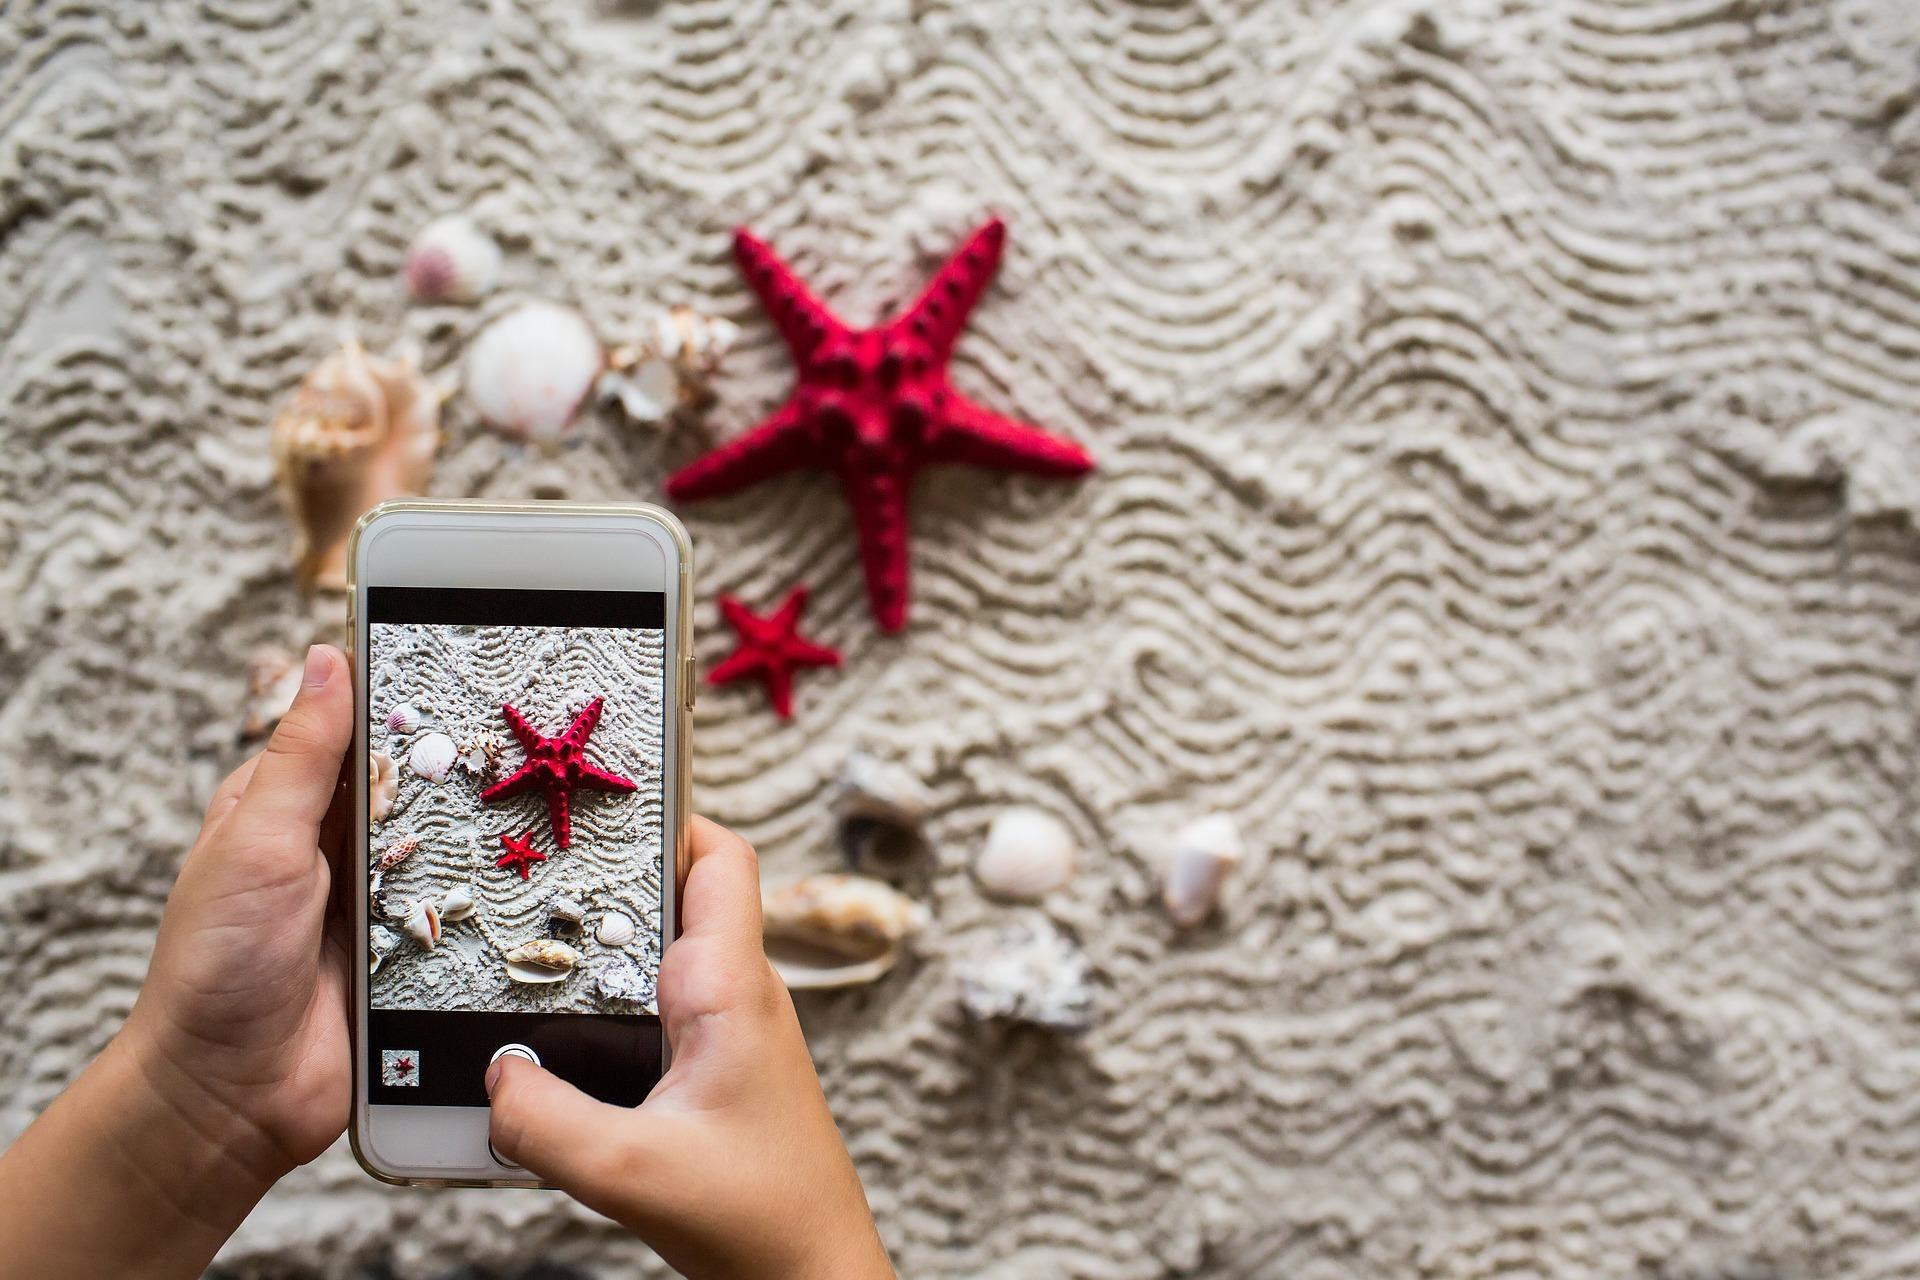 mobile-phone-image-digital-marketing-bakersfield-ca